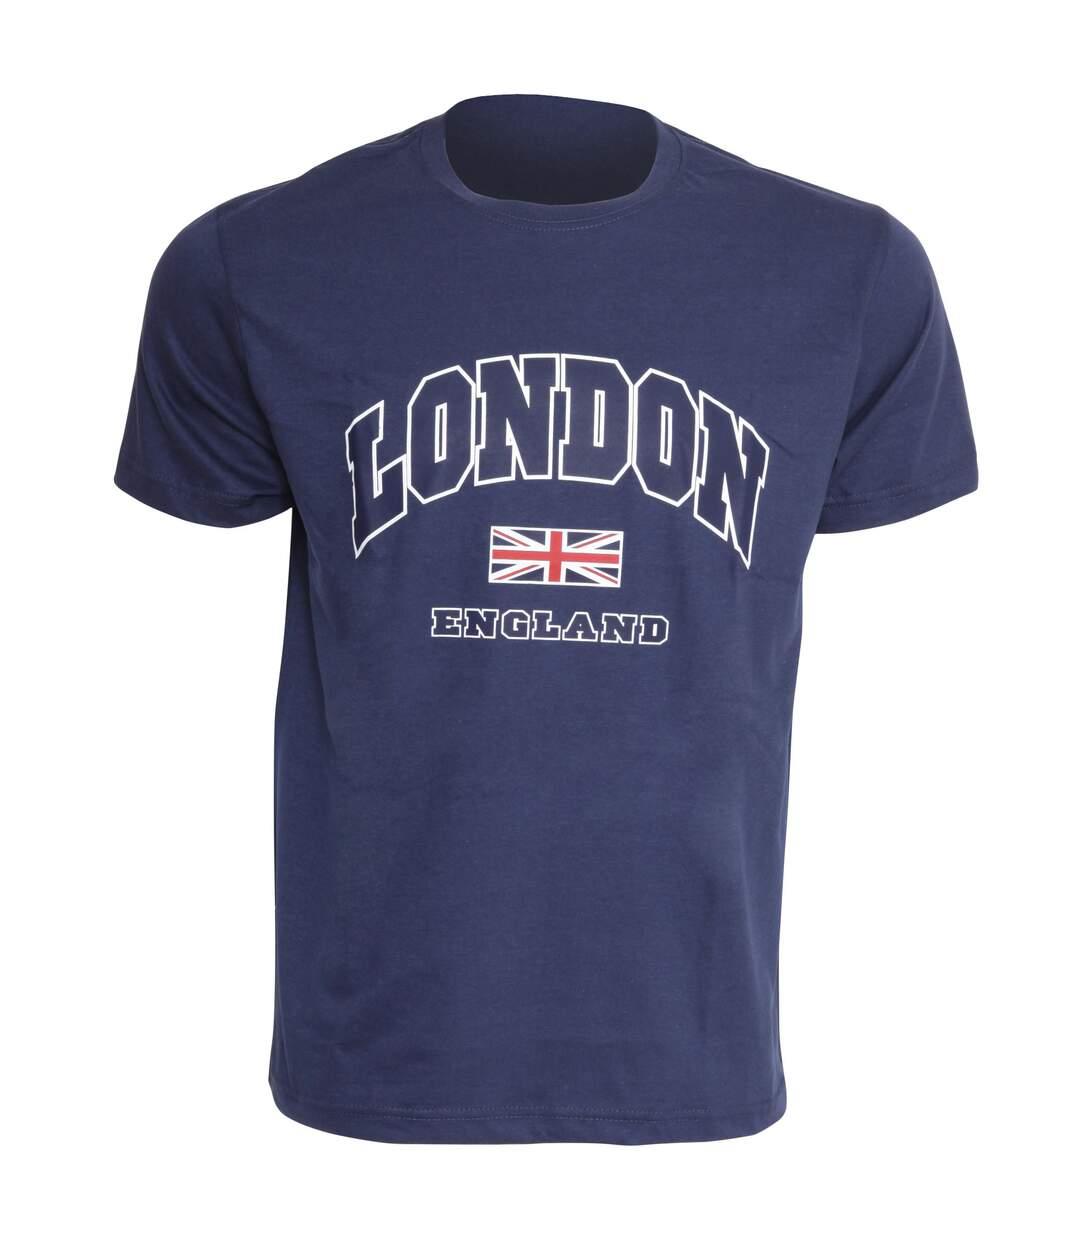 Mens London England Print 100% Cotton Short Sleeve Casual T-Shirt/Top (Navy) - UTSHIRT133